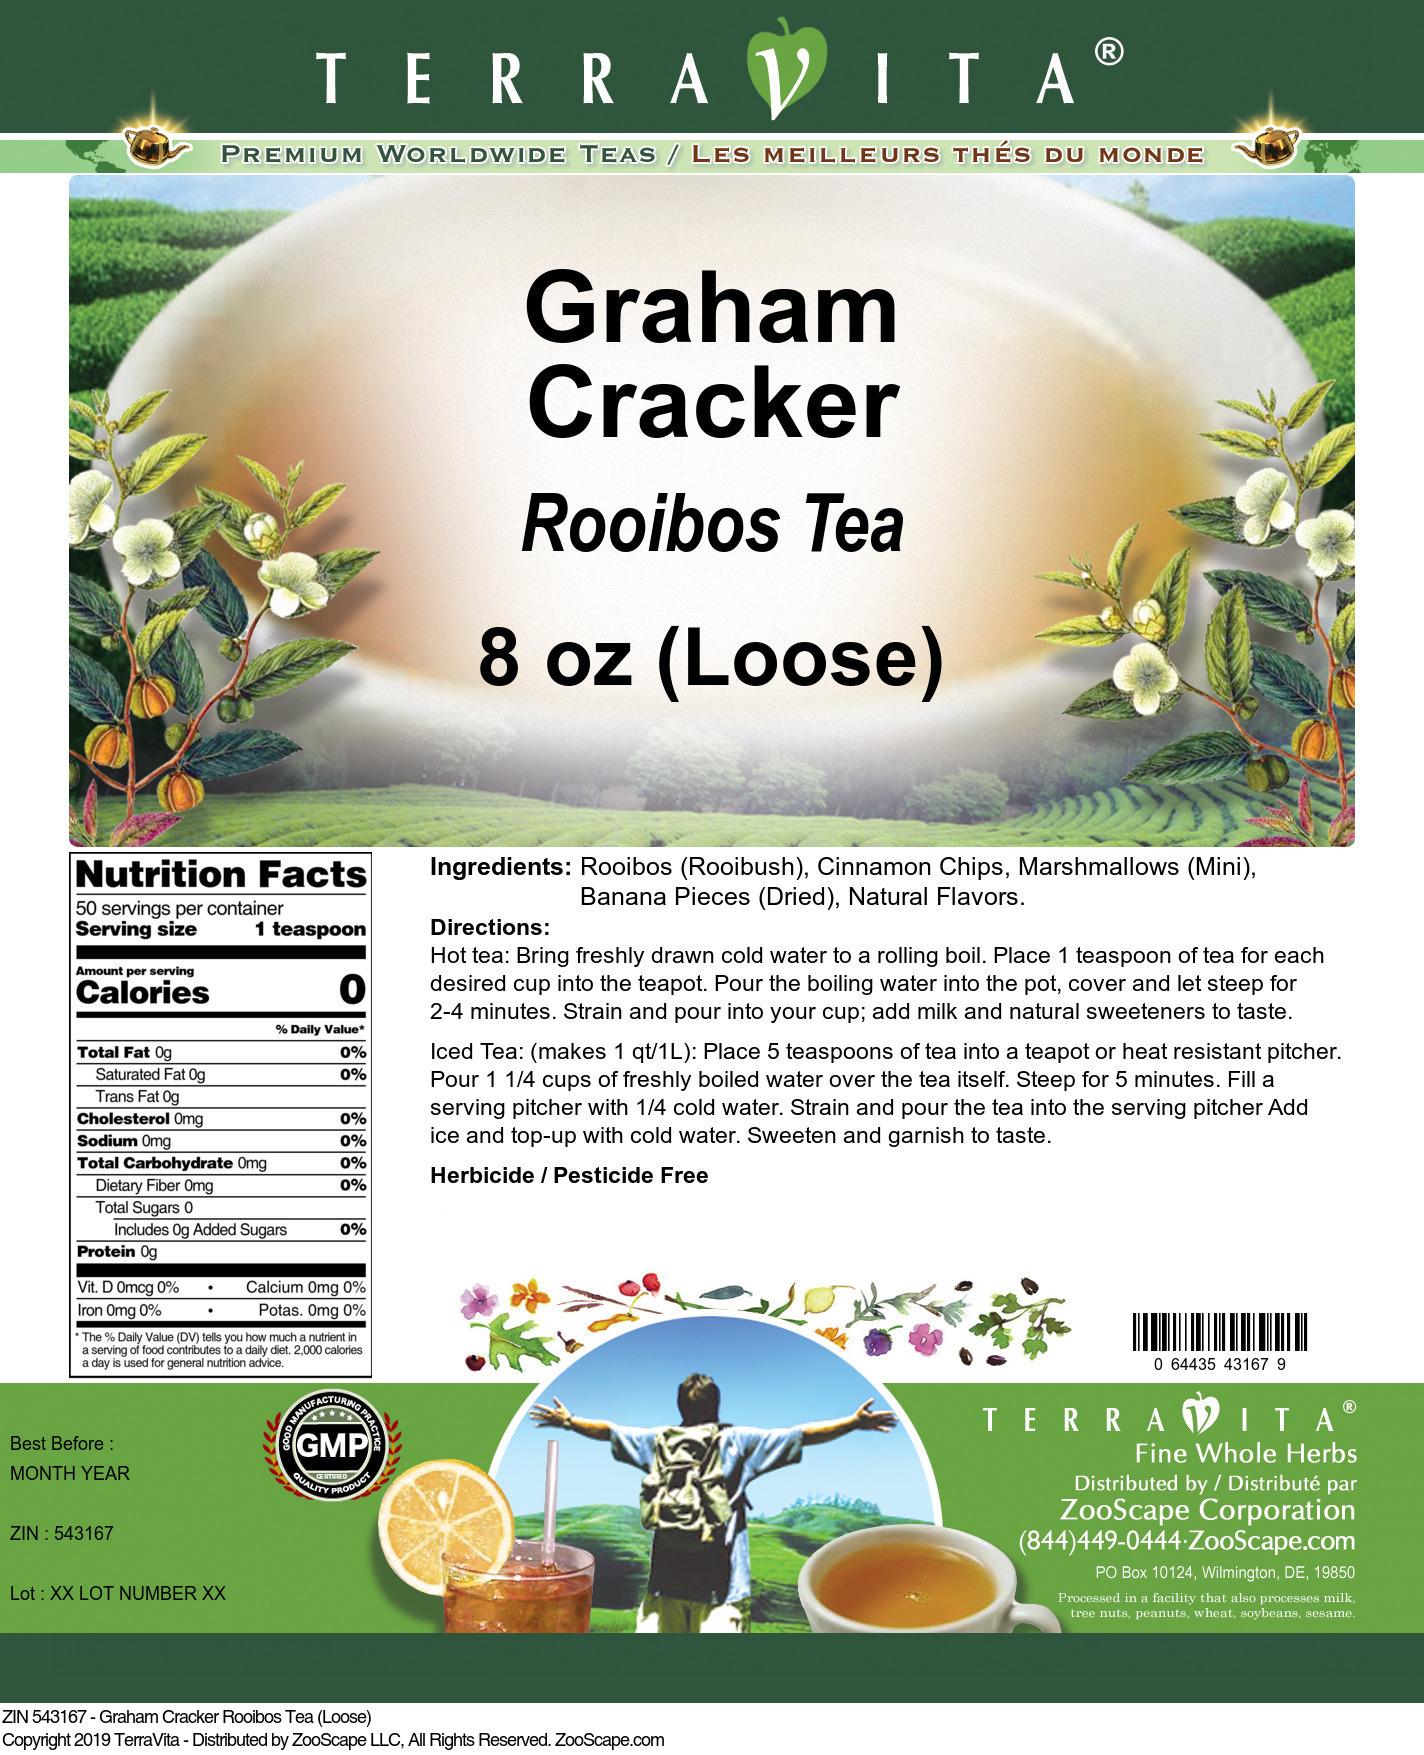 Graham Cracker Rooibos Tea